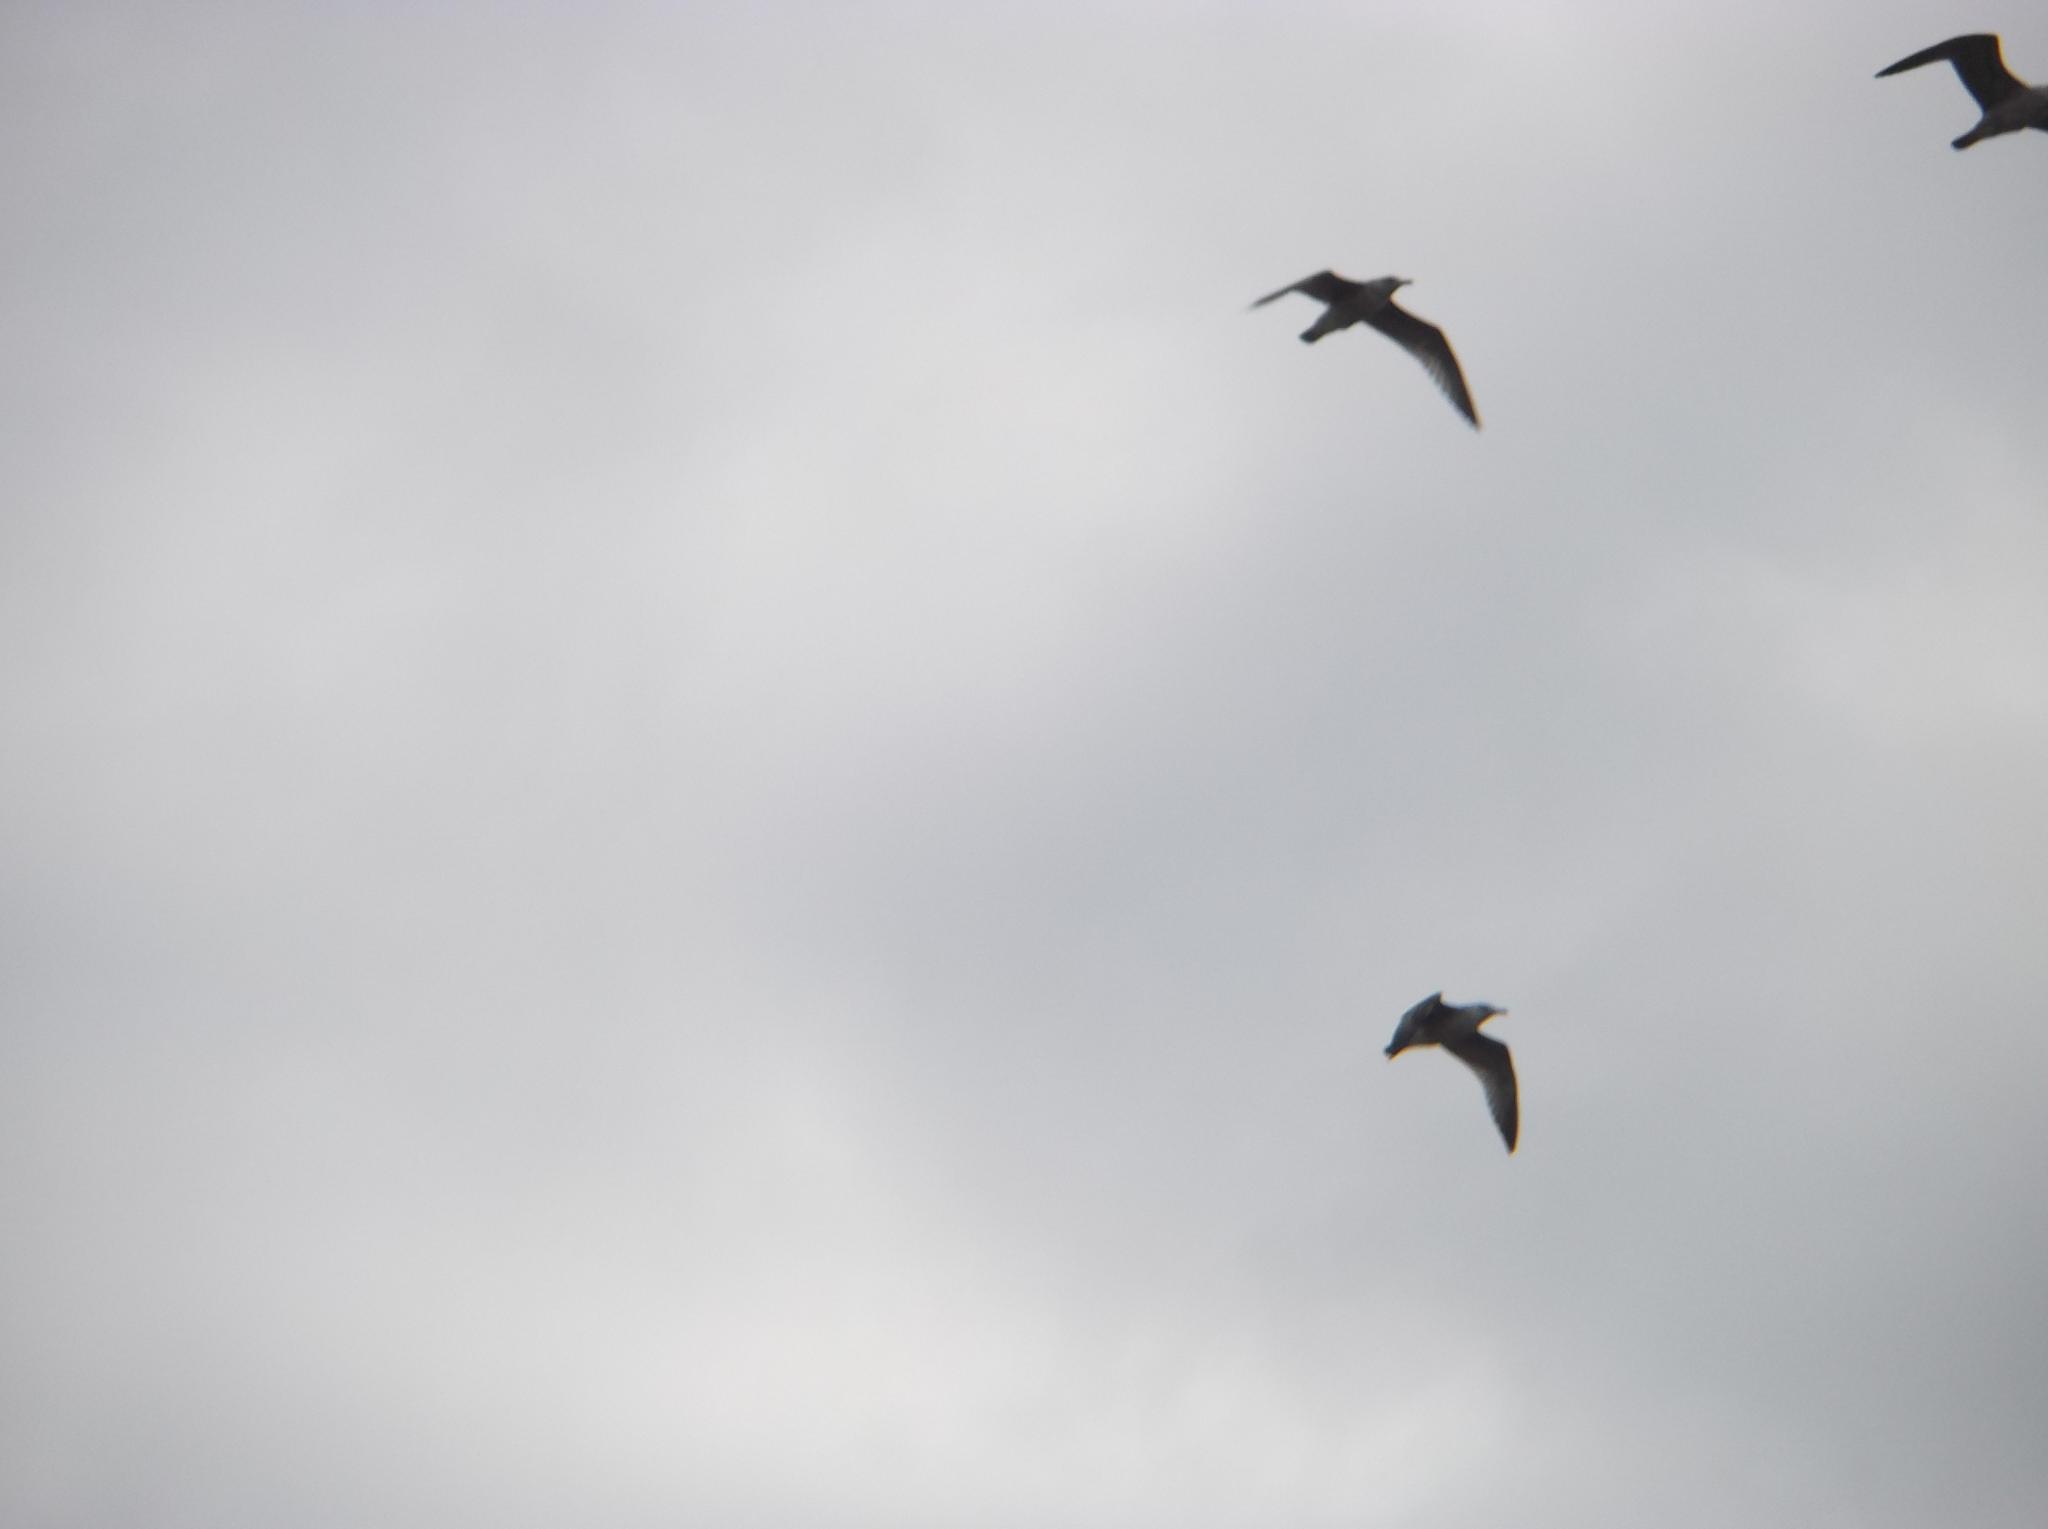 Birds in the skies. by Zita Užkuraitienė